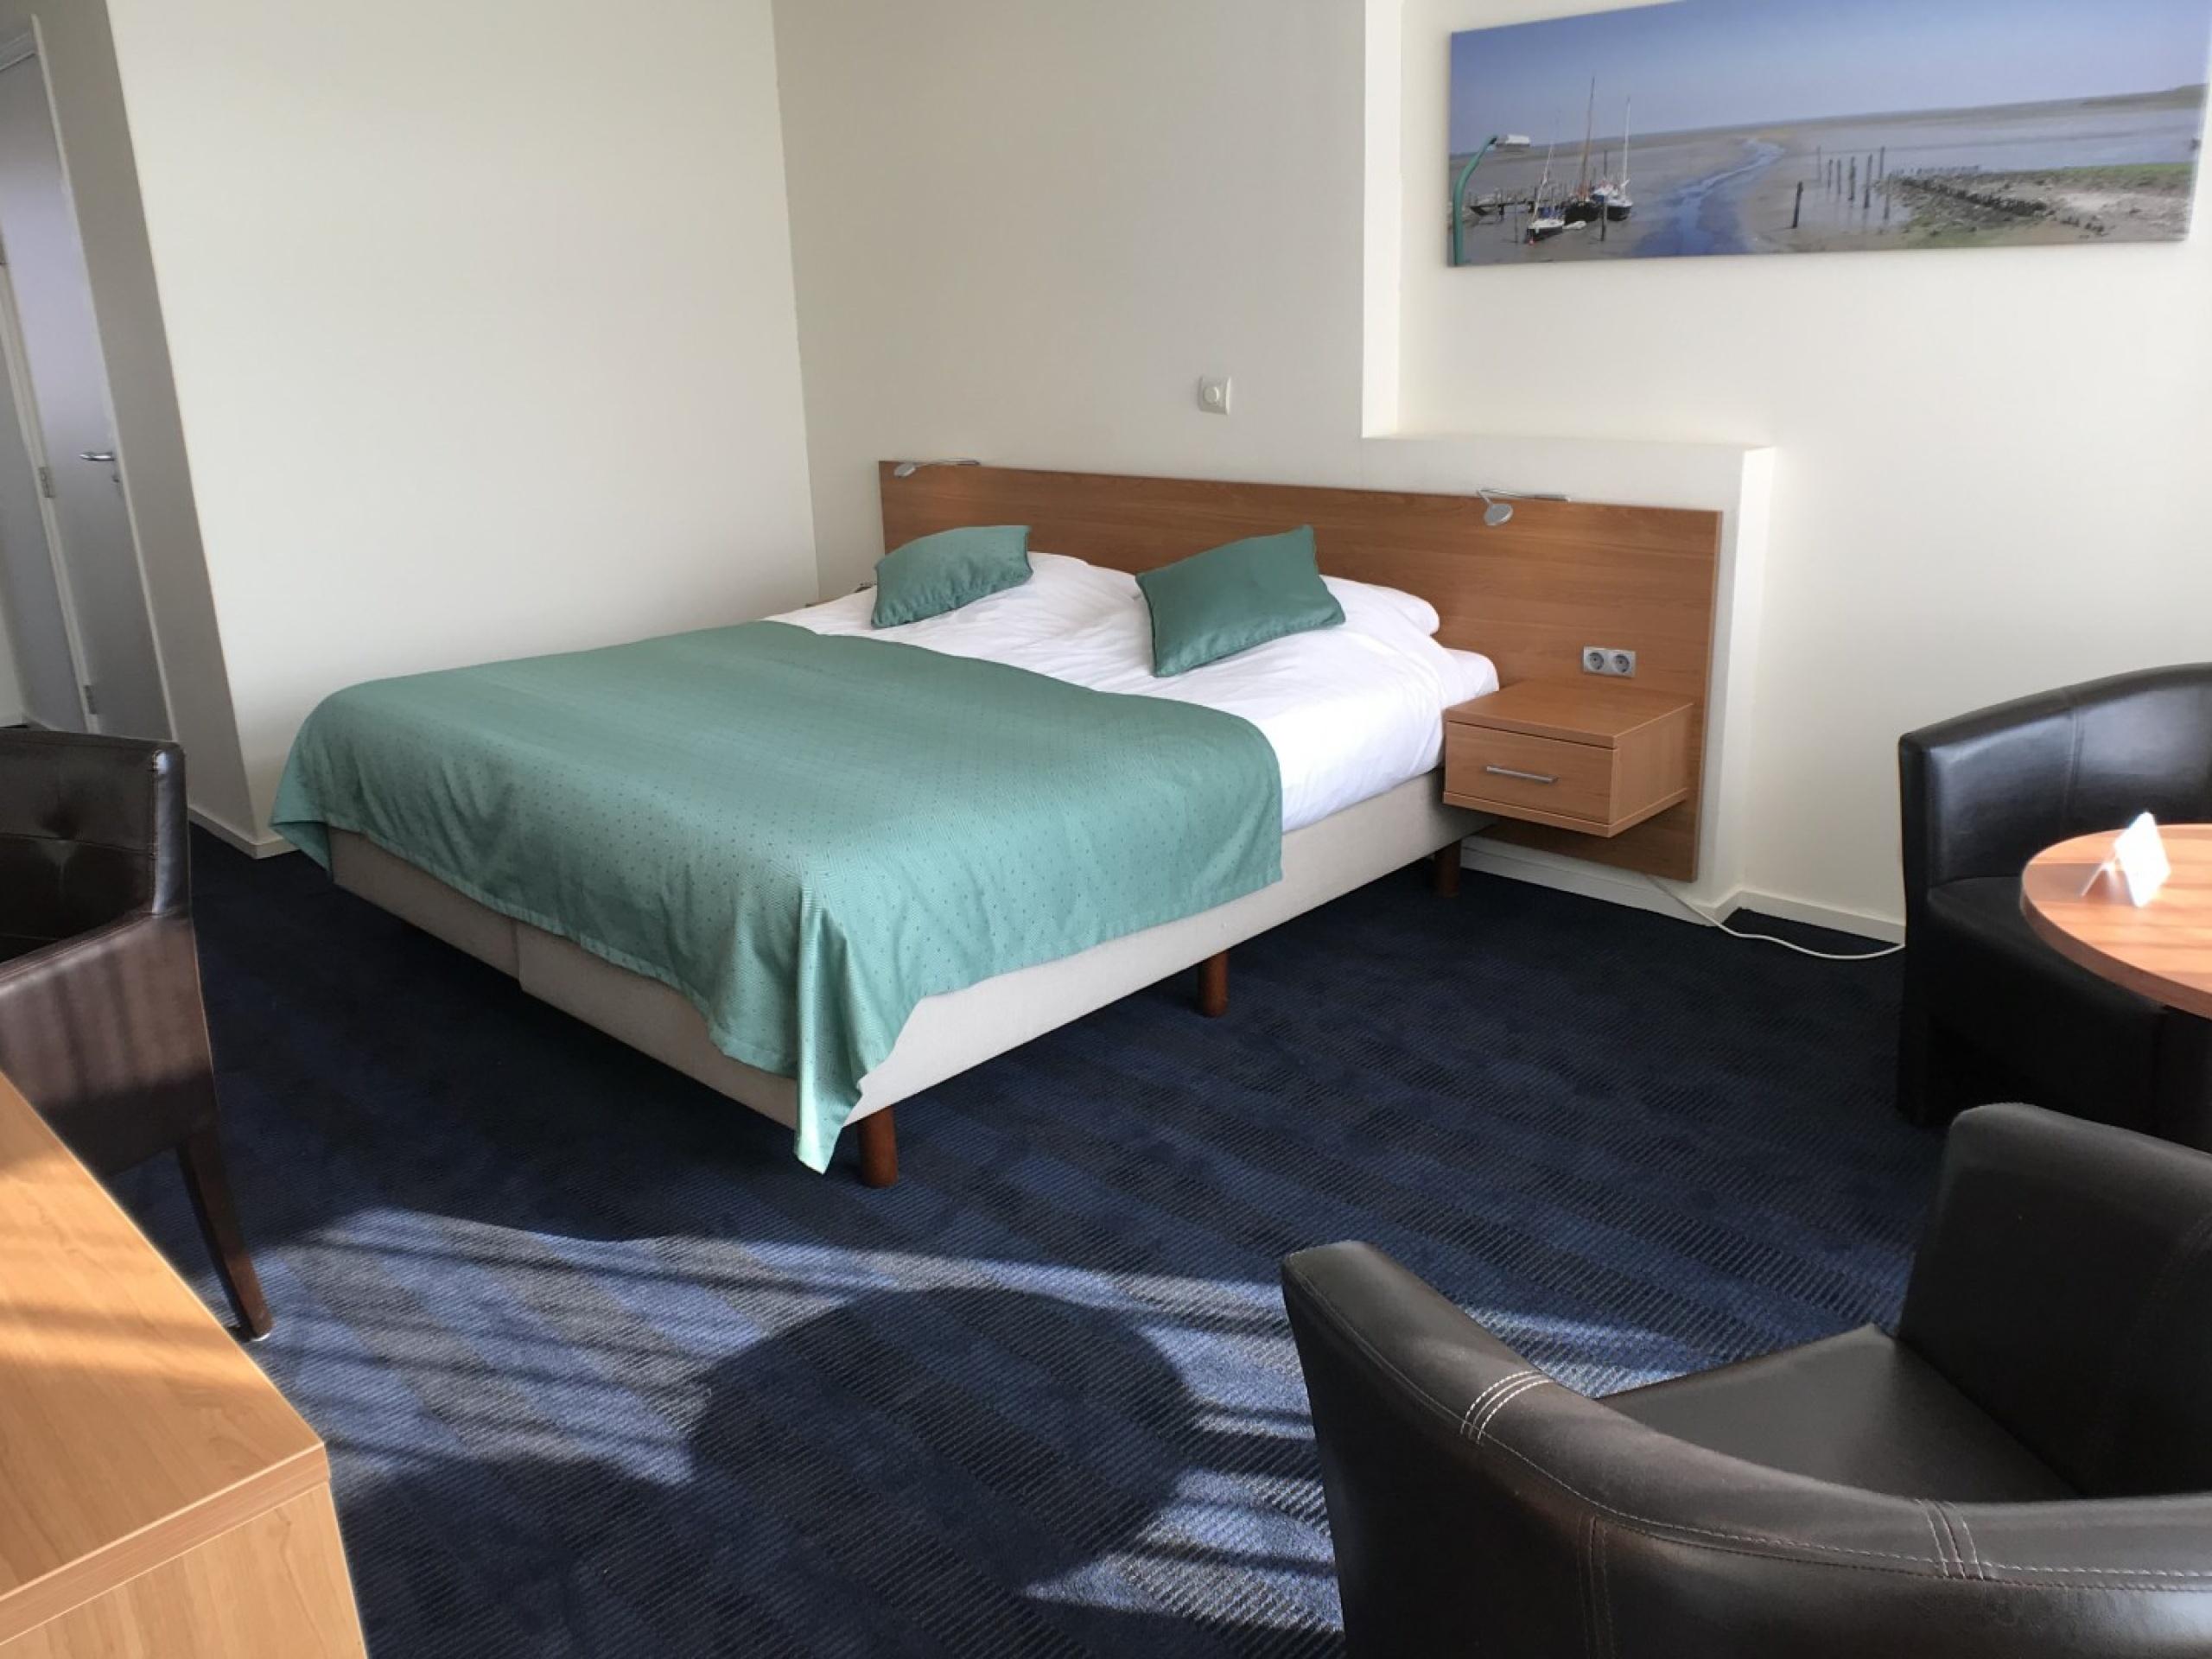 Great hotel in the seaside resort of De Koog